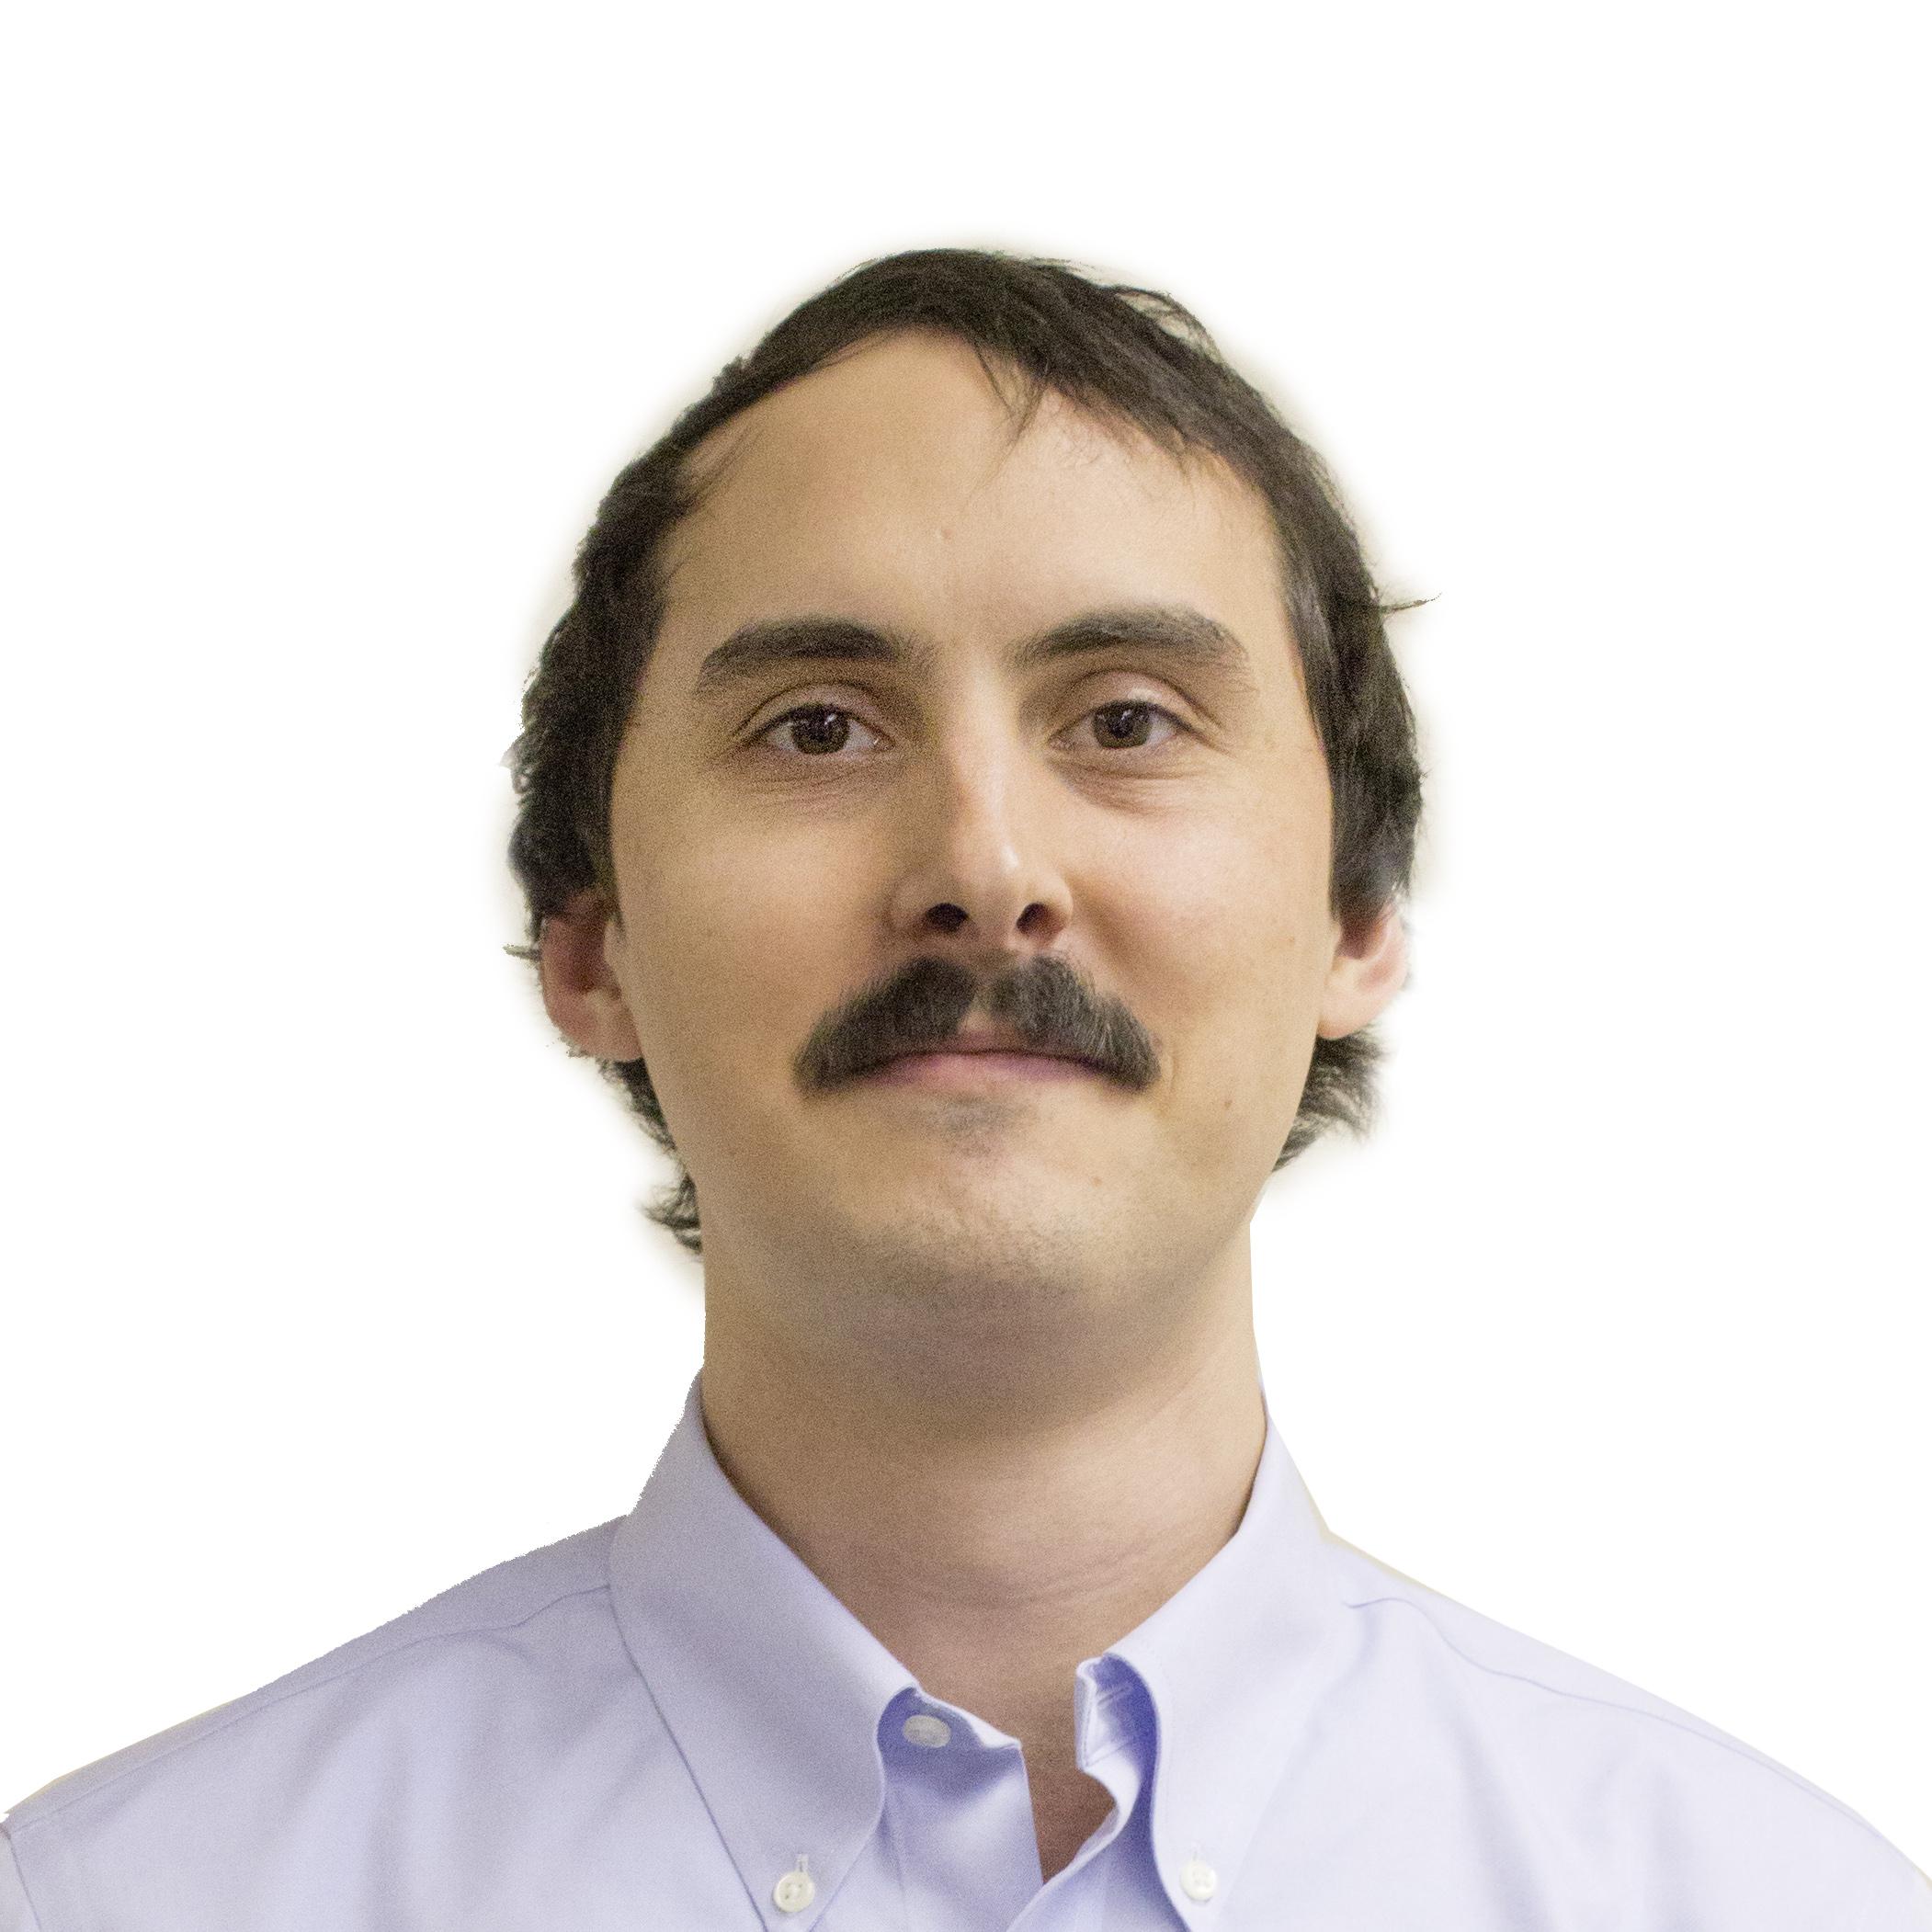 Charles Putman, Project Accountant